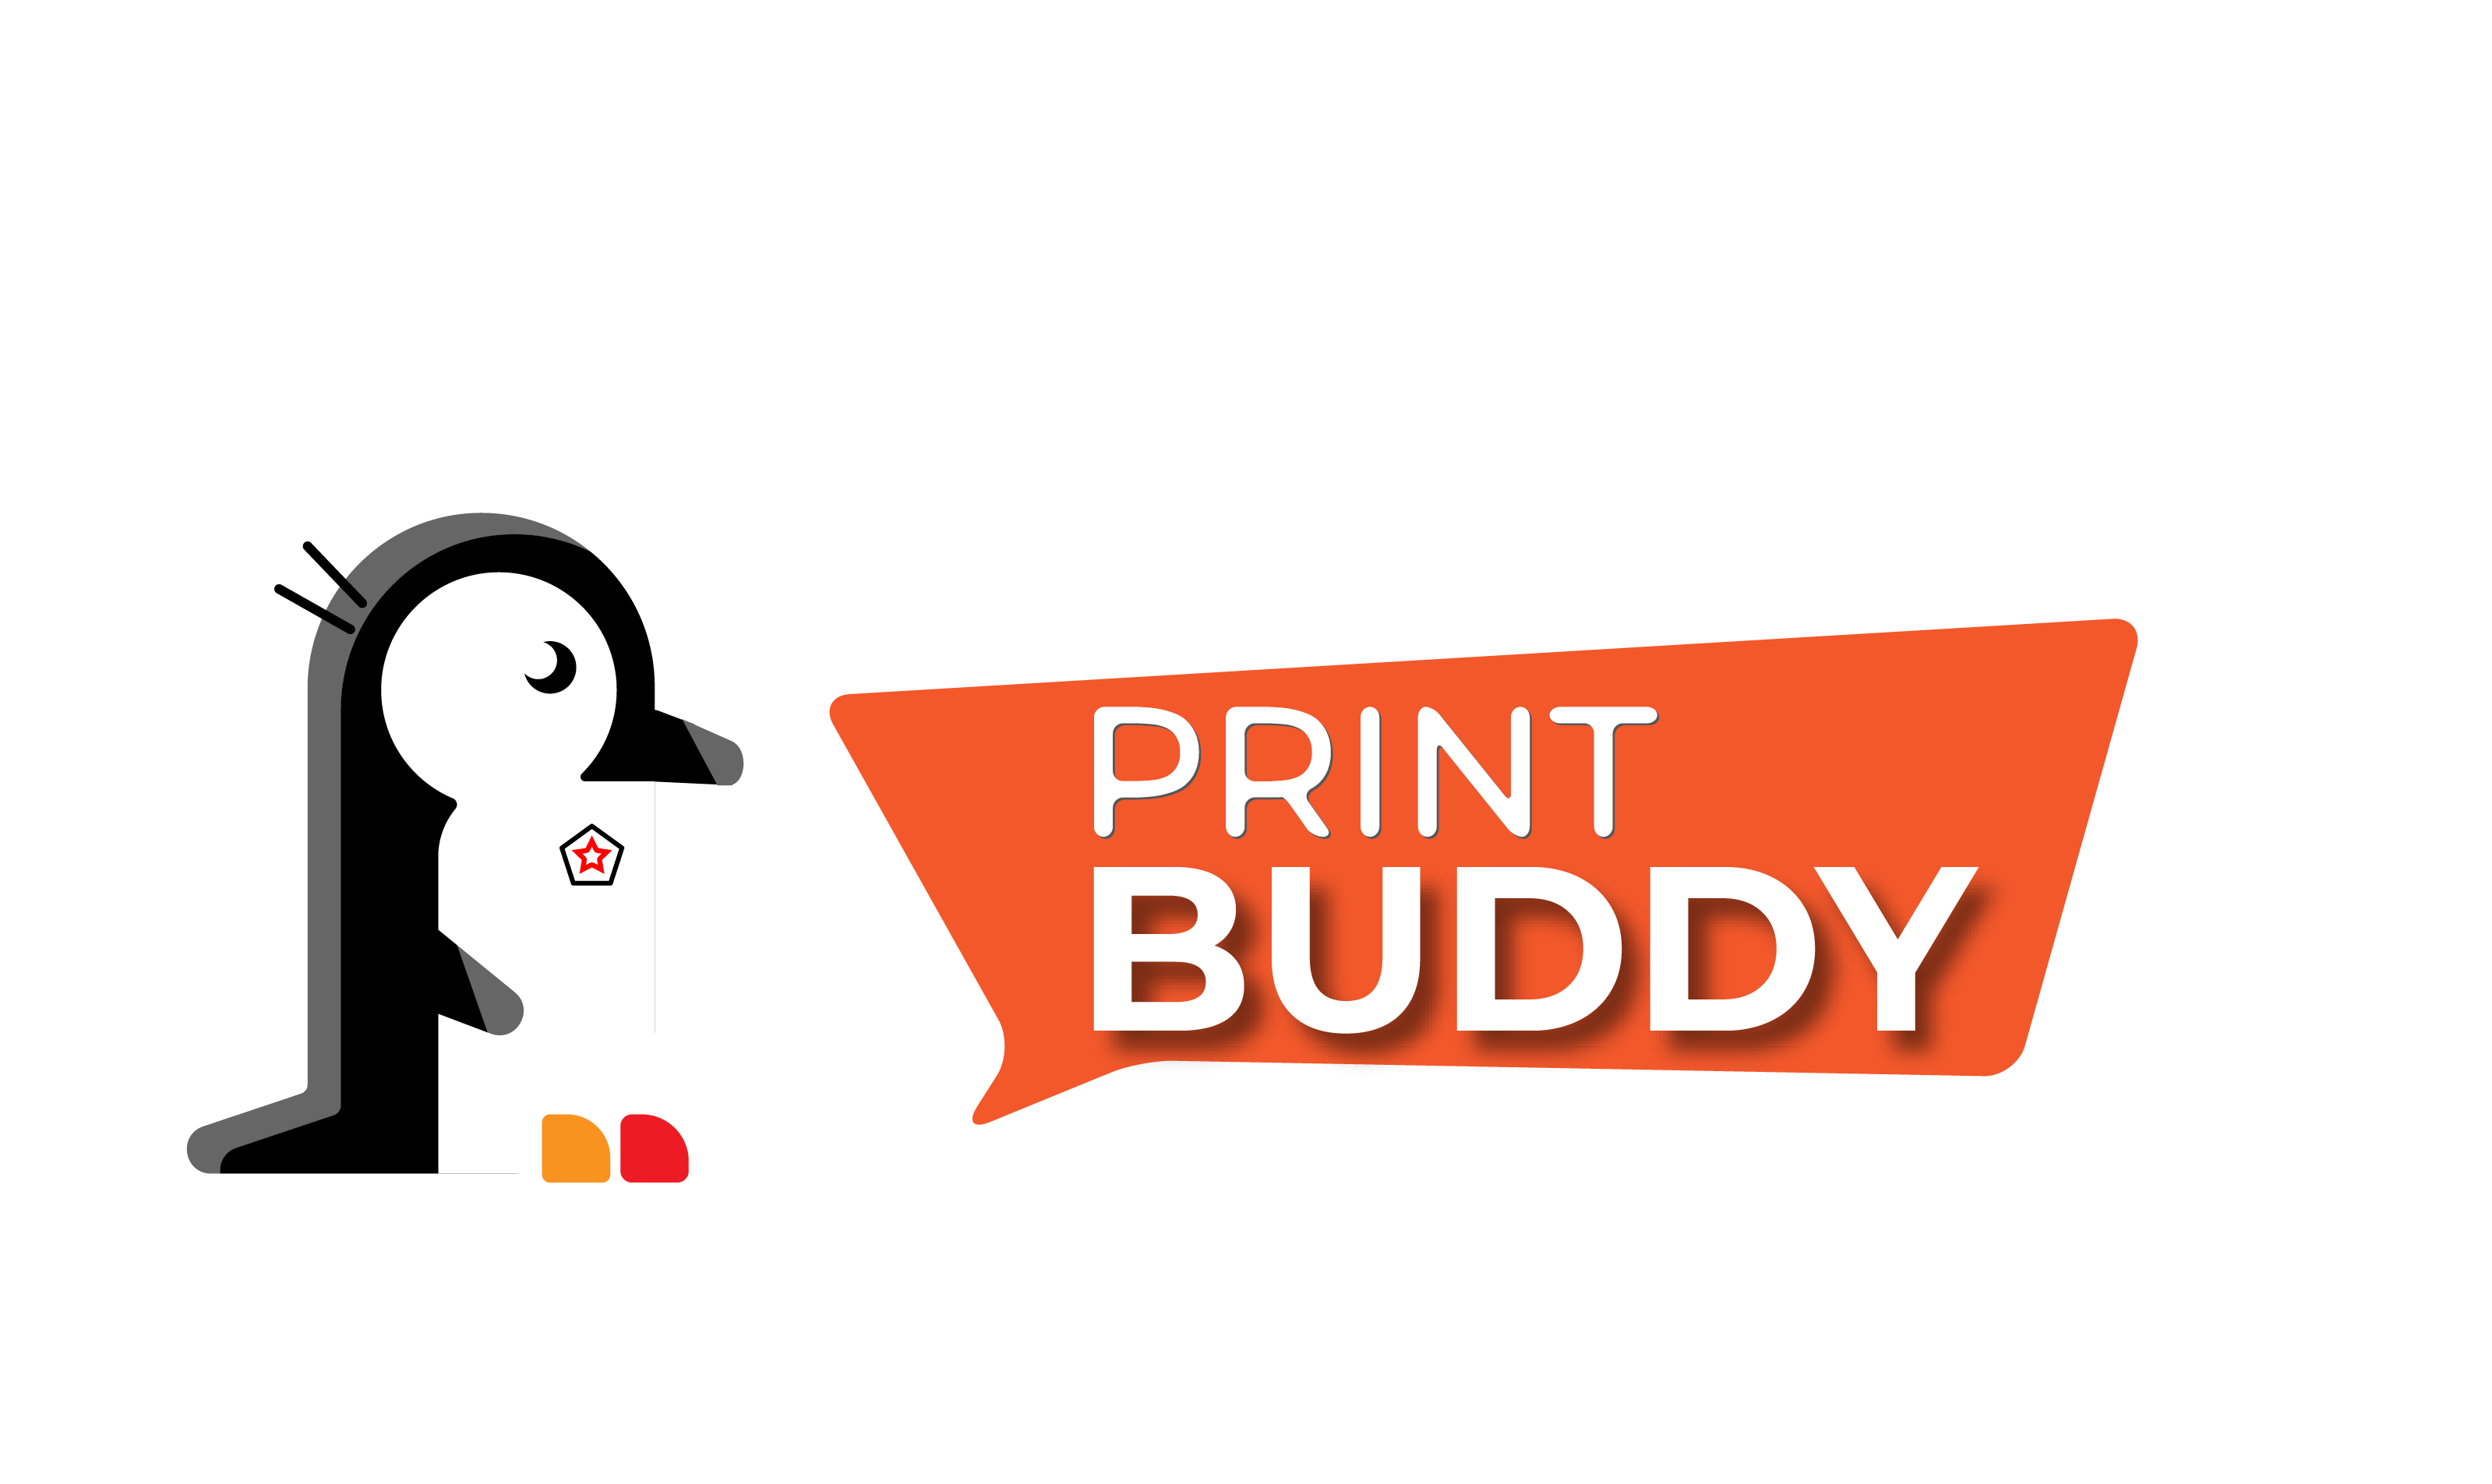 Print Buddy